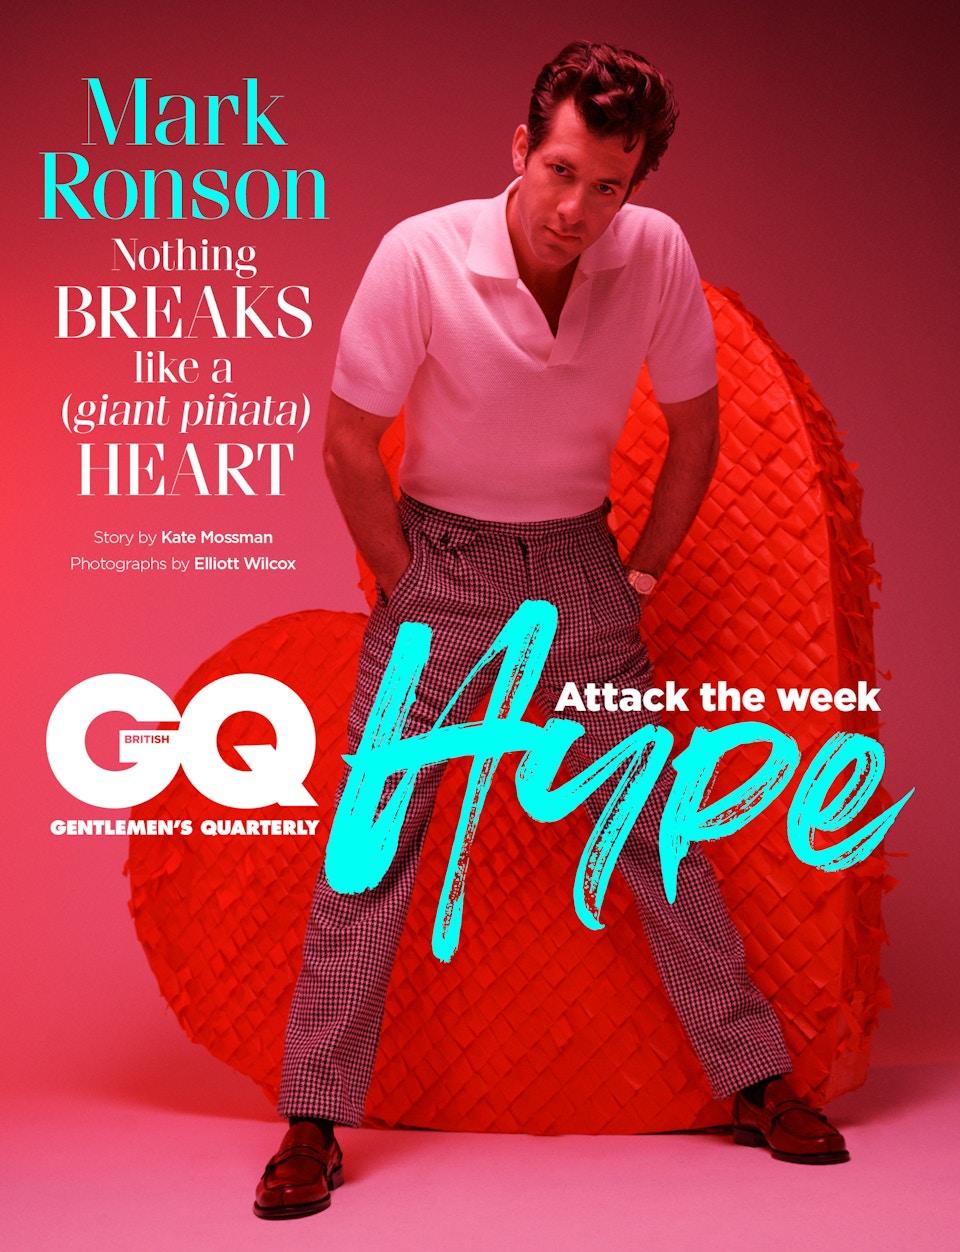 GQ Hype - Mark Ronson